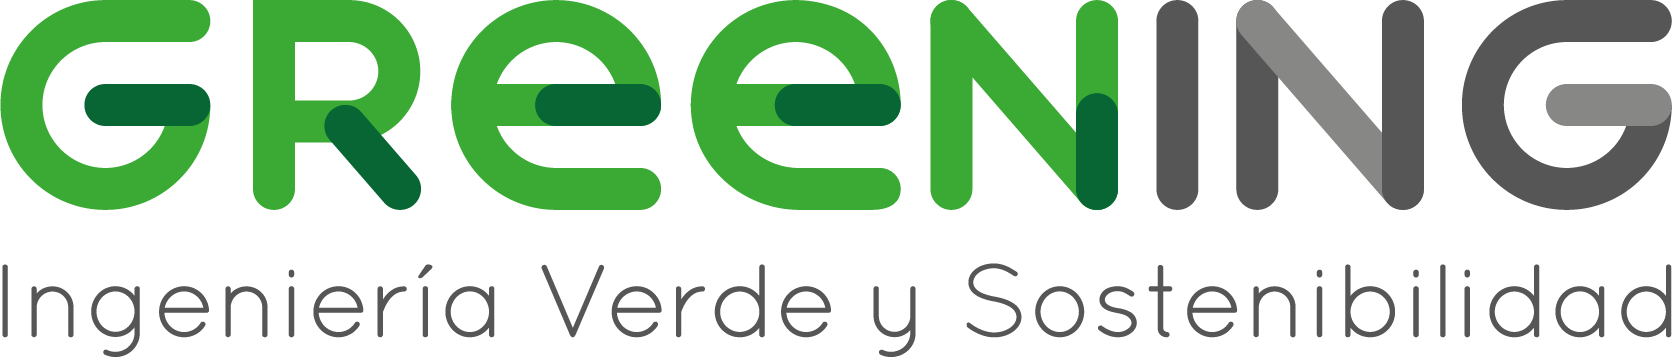 Empresas Desafio10x: Greening SpA